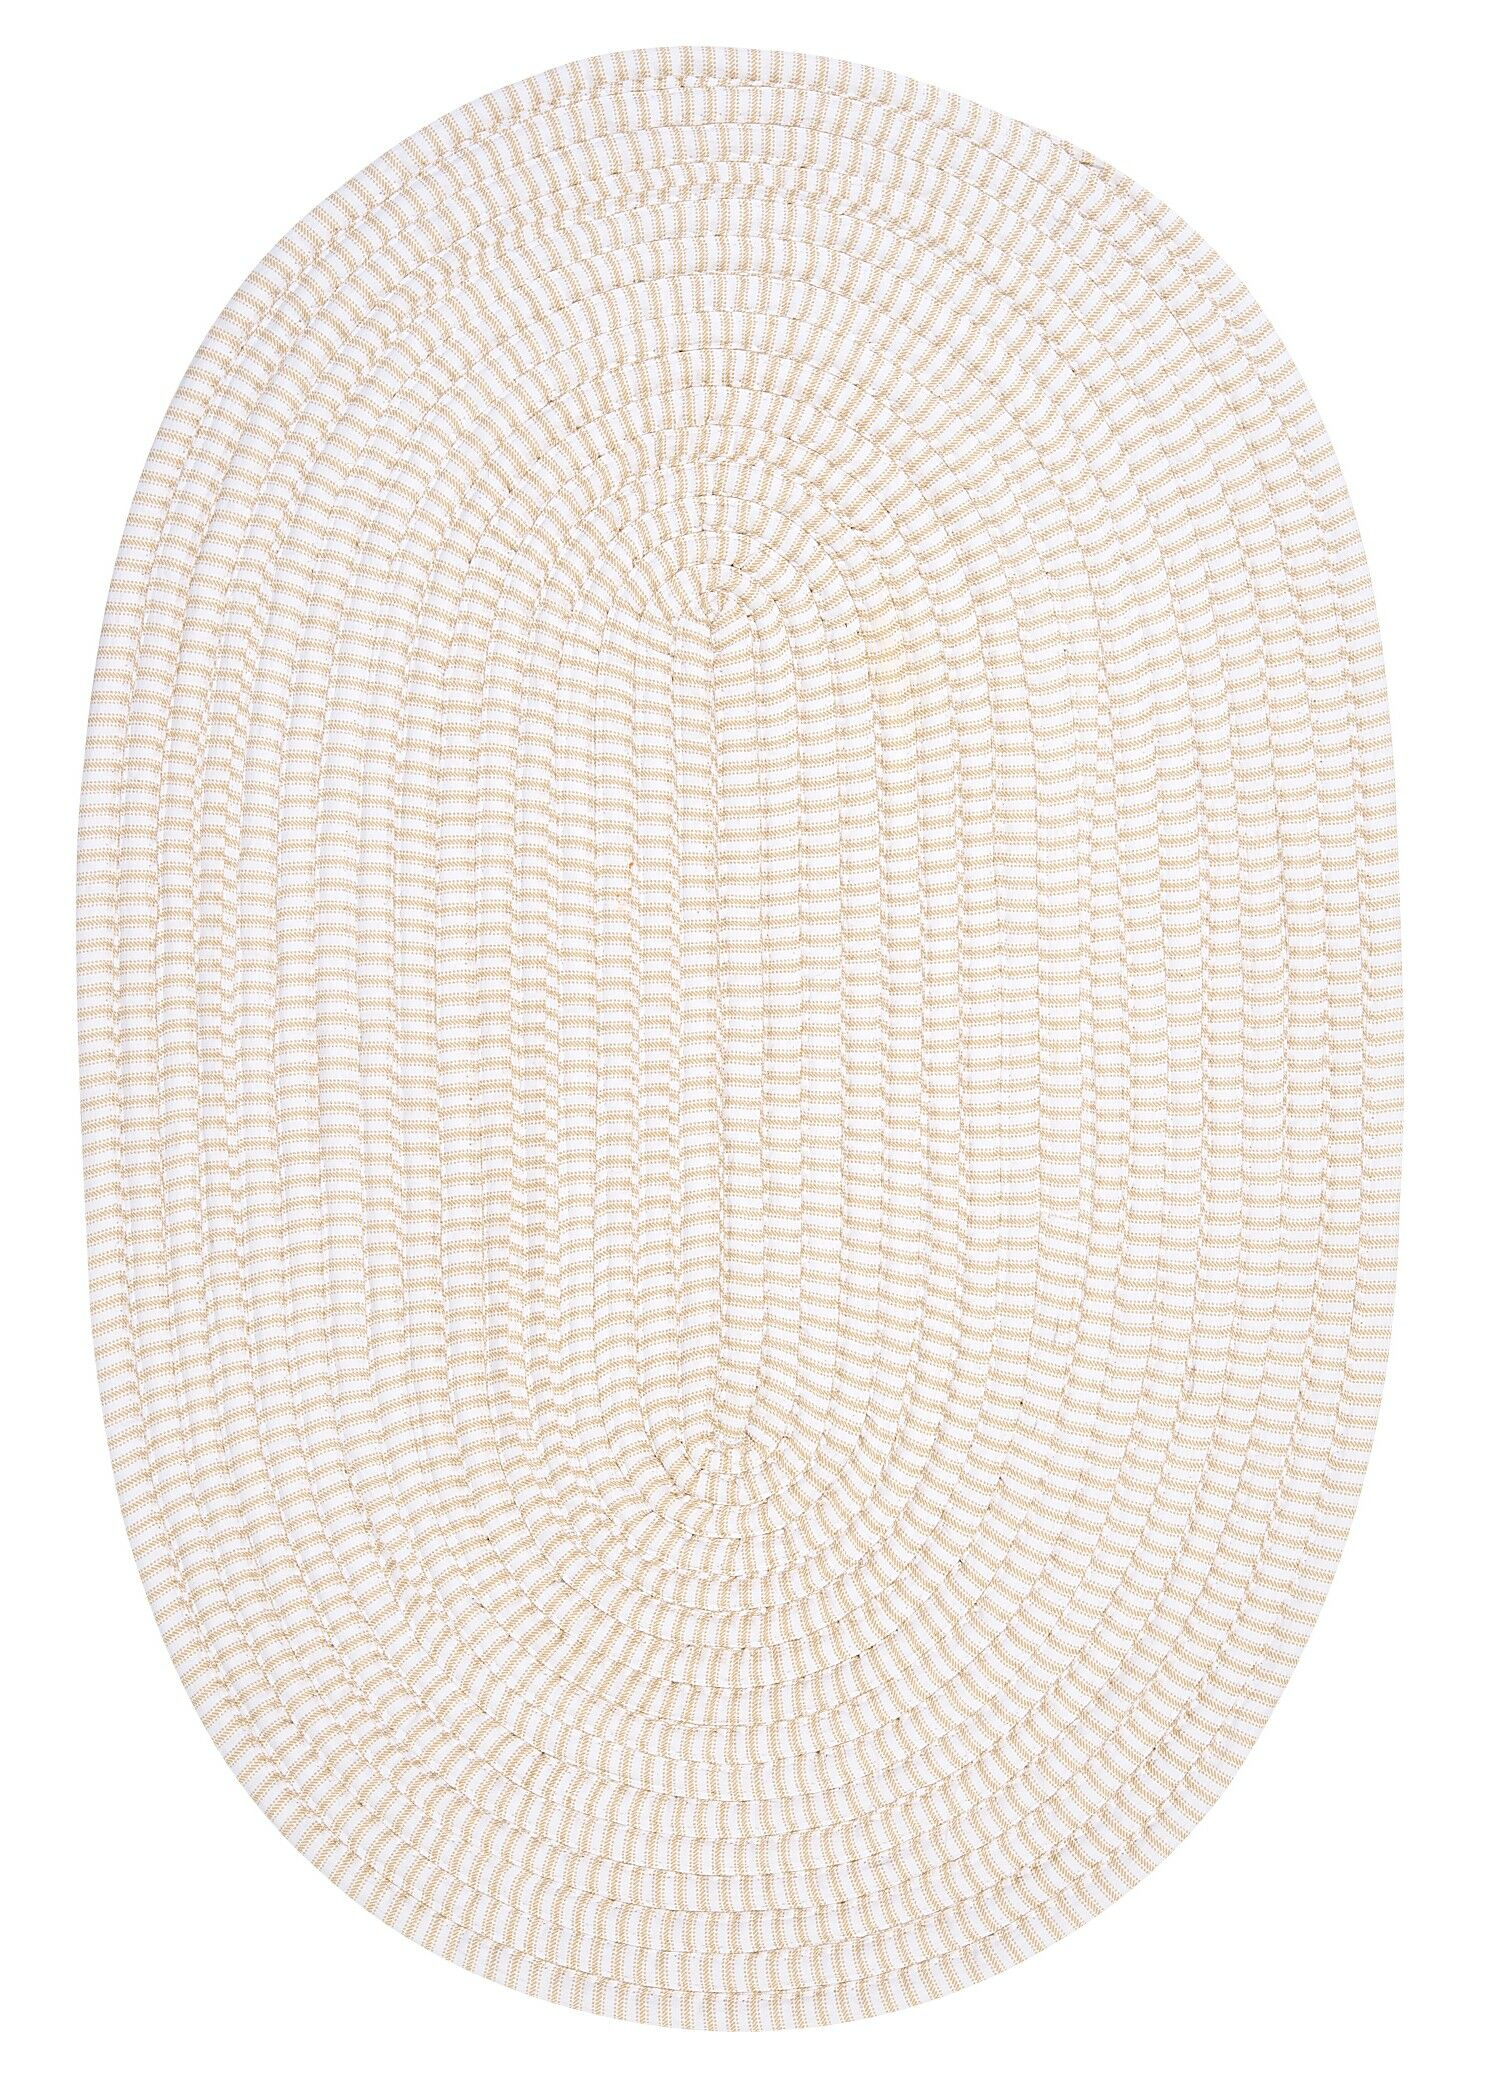 Ticking Stripe Canvas Light Gray Area Rug Rug Size: Round 10'